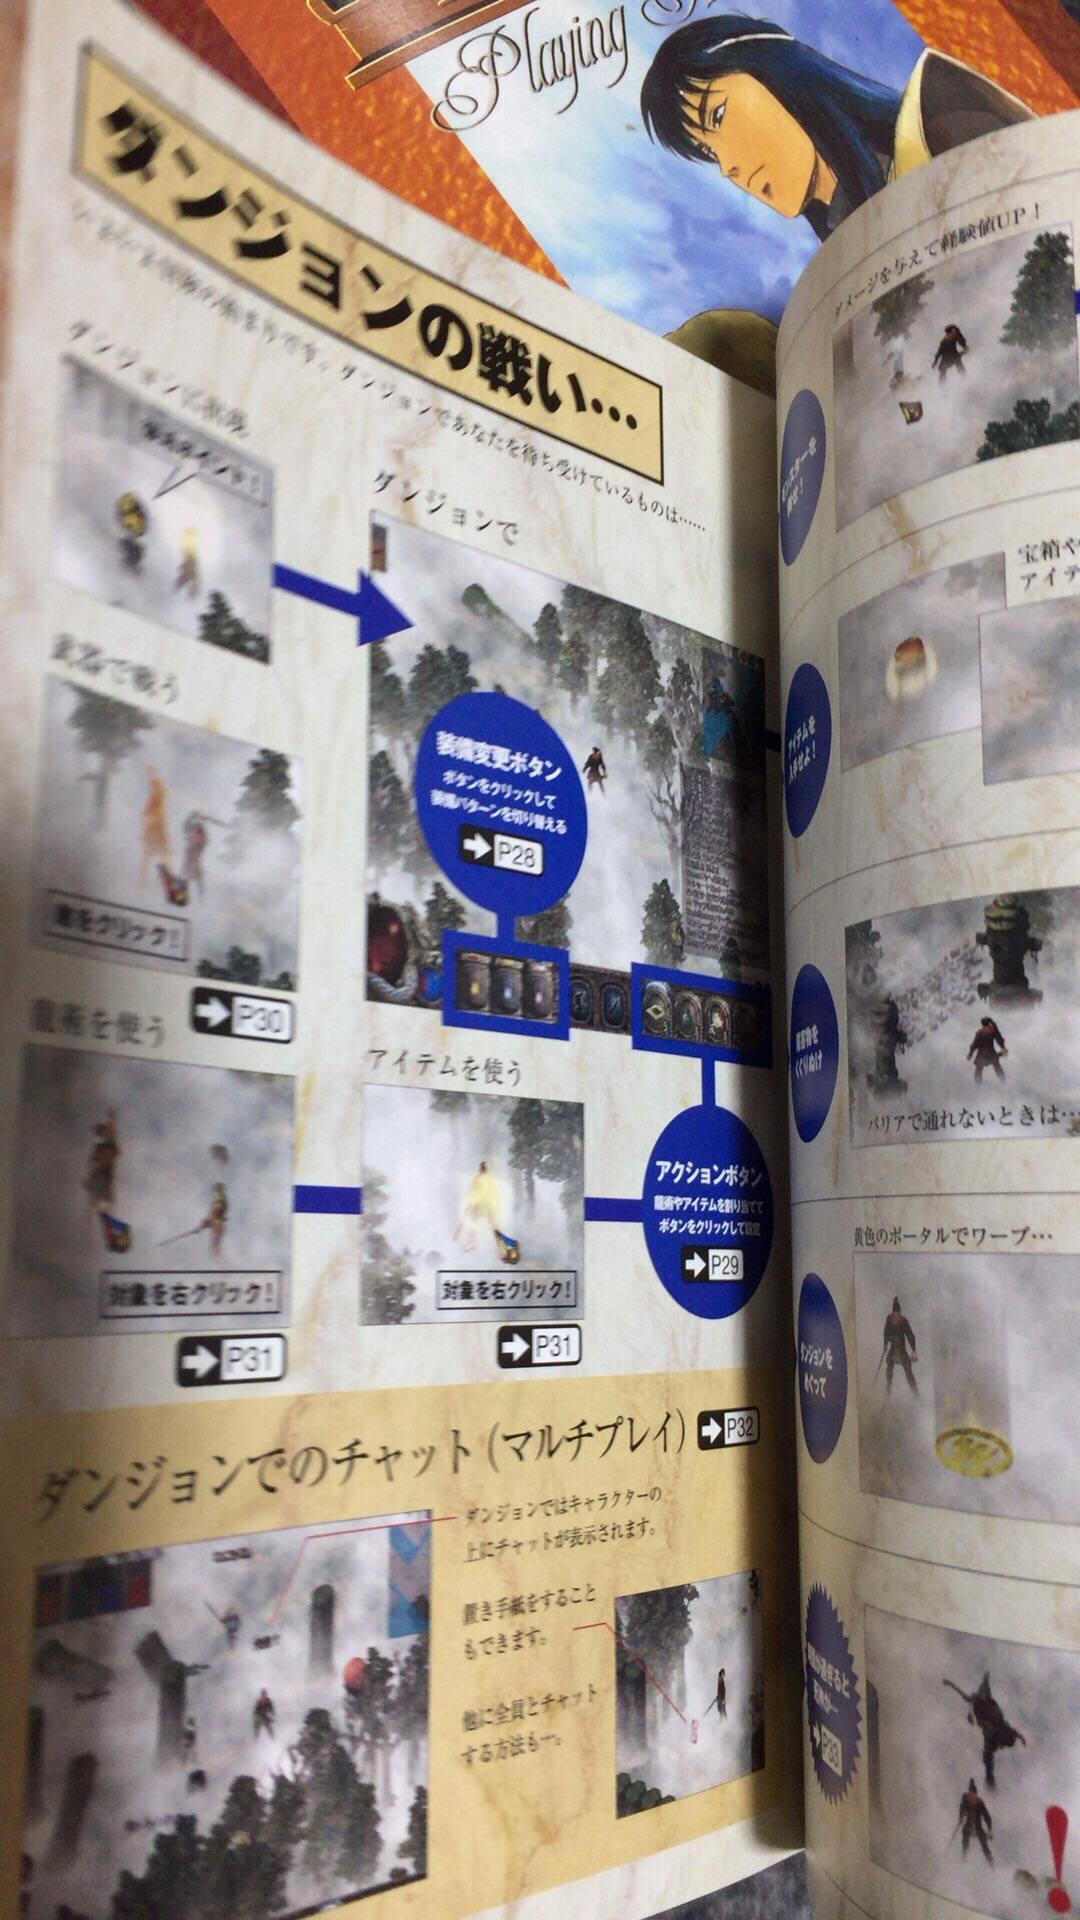 1DjNM65AcWuG9 - 【悲報】steamホリセ、全く話題にならず...